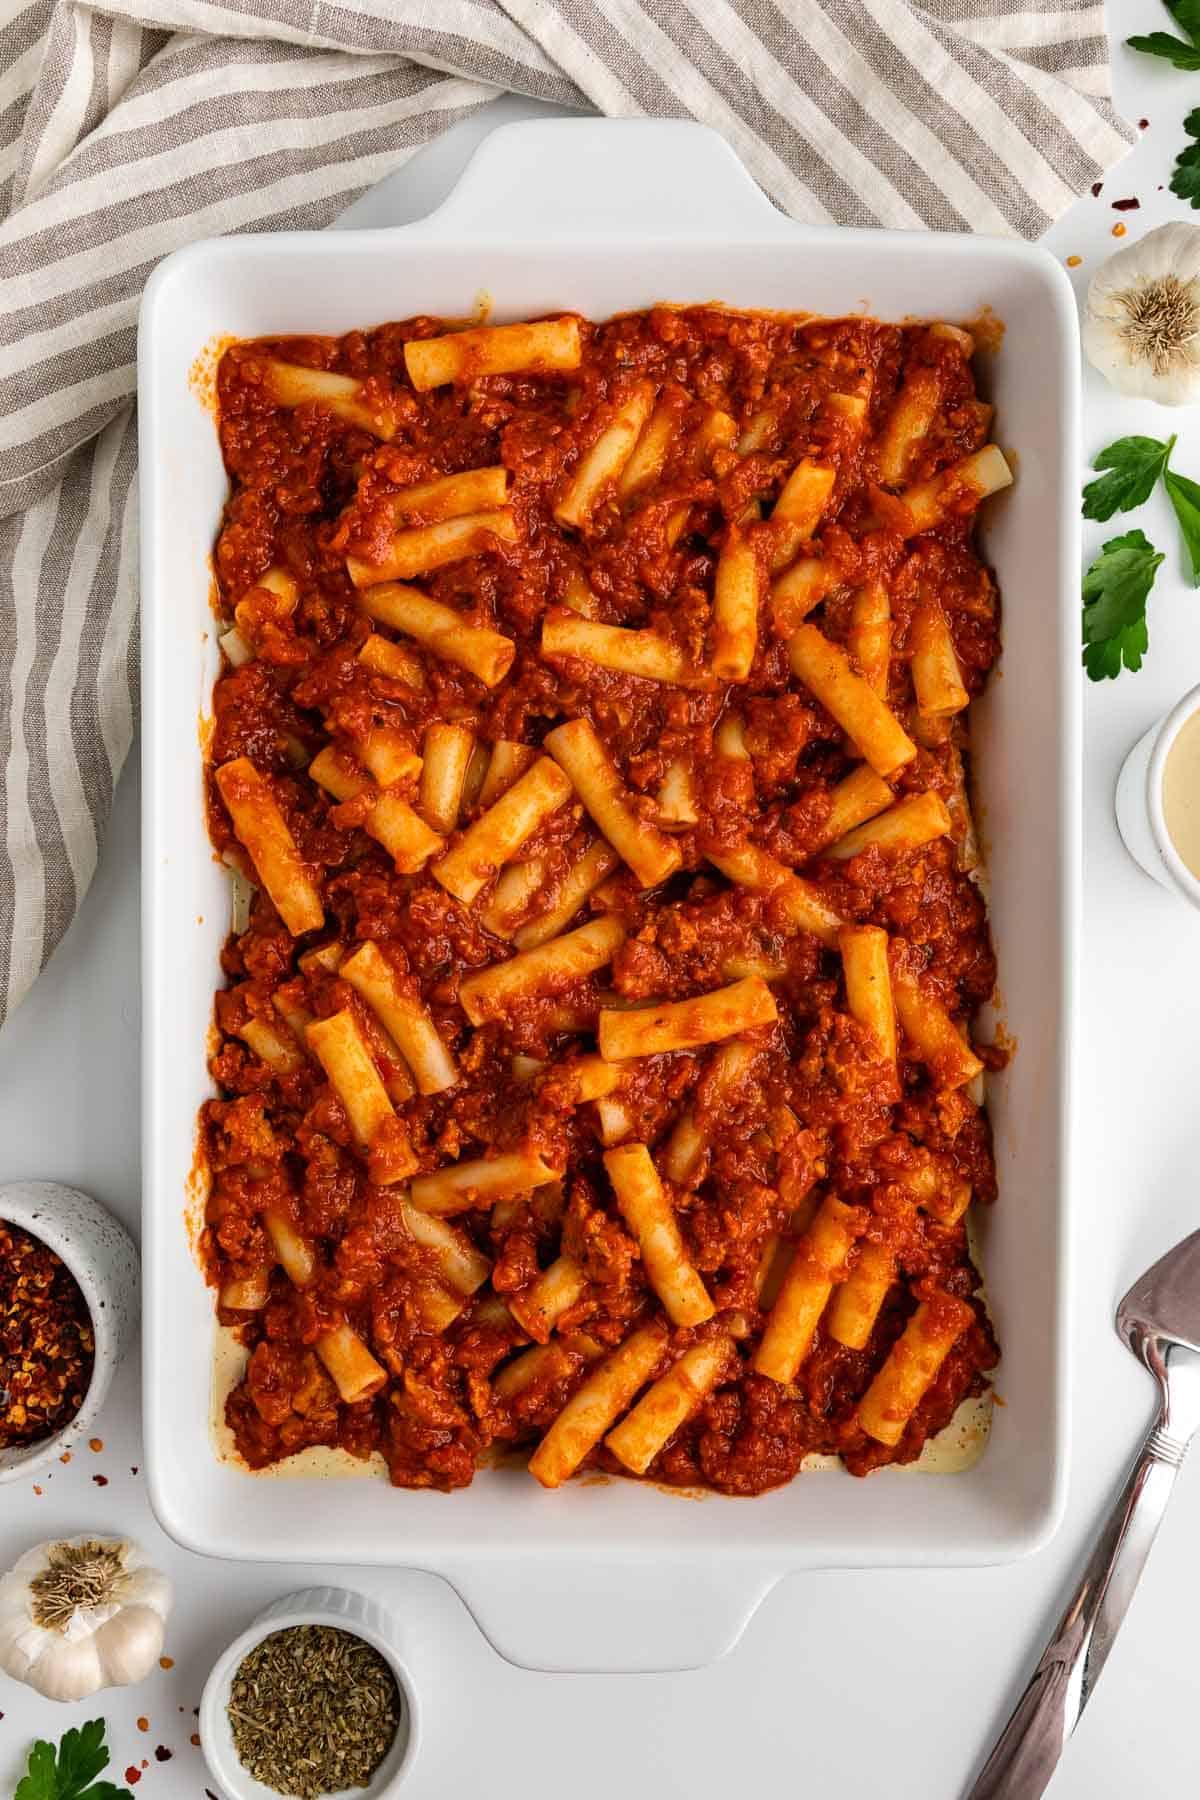 ziti pasta and marinara sauce mixed together inside a white casserole dish